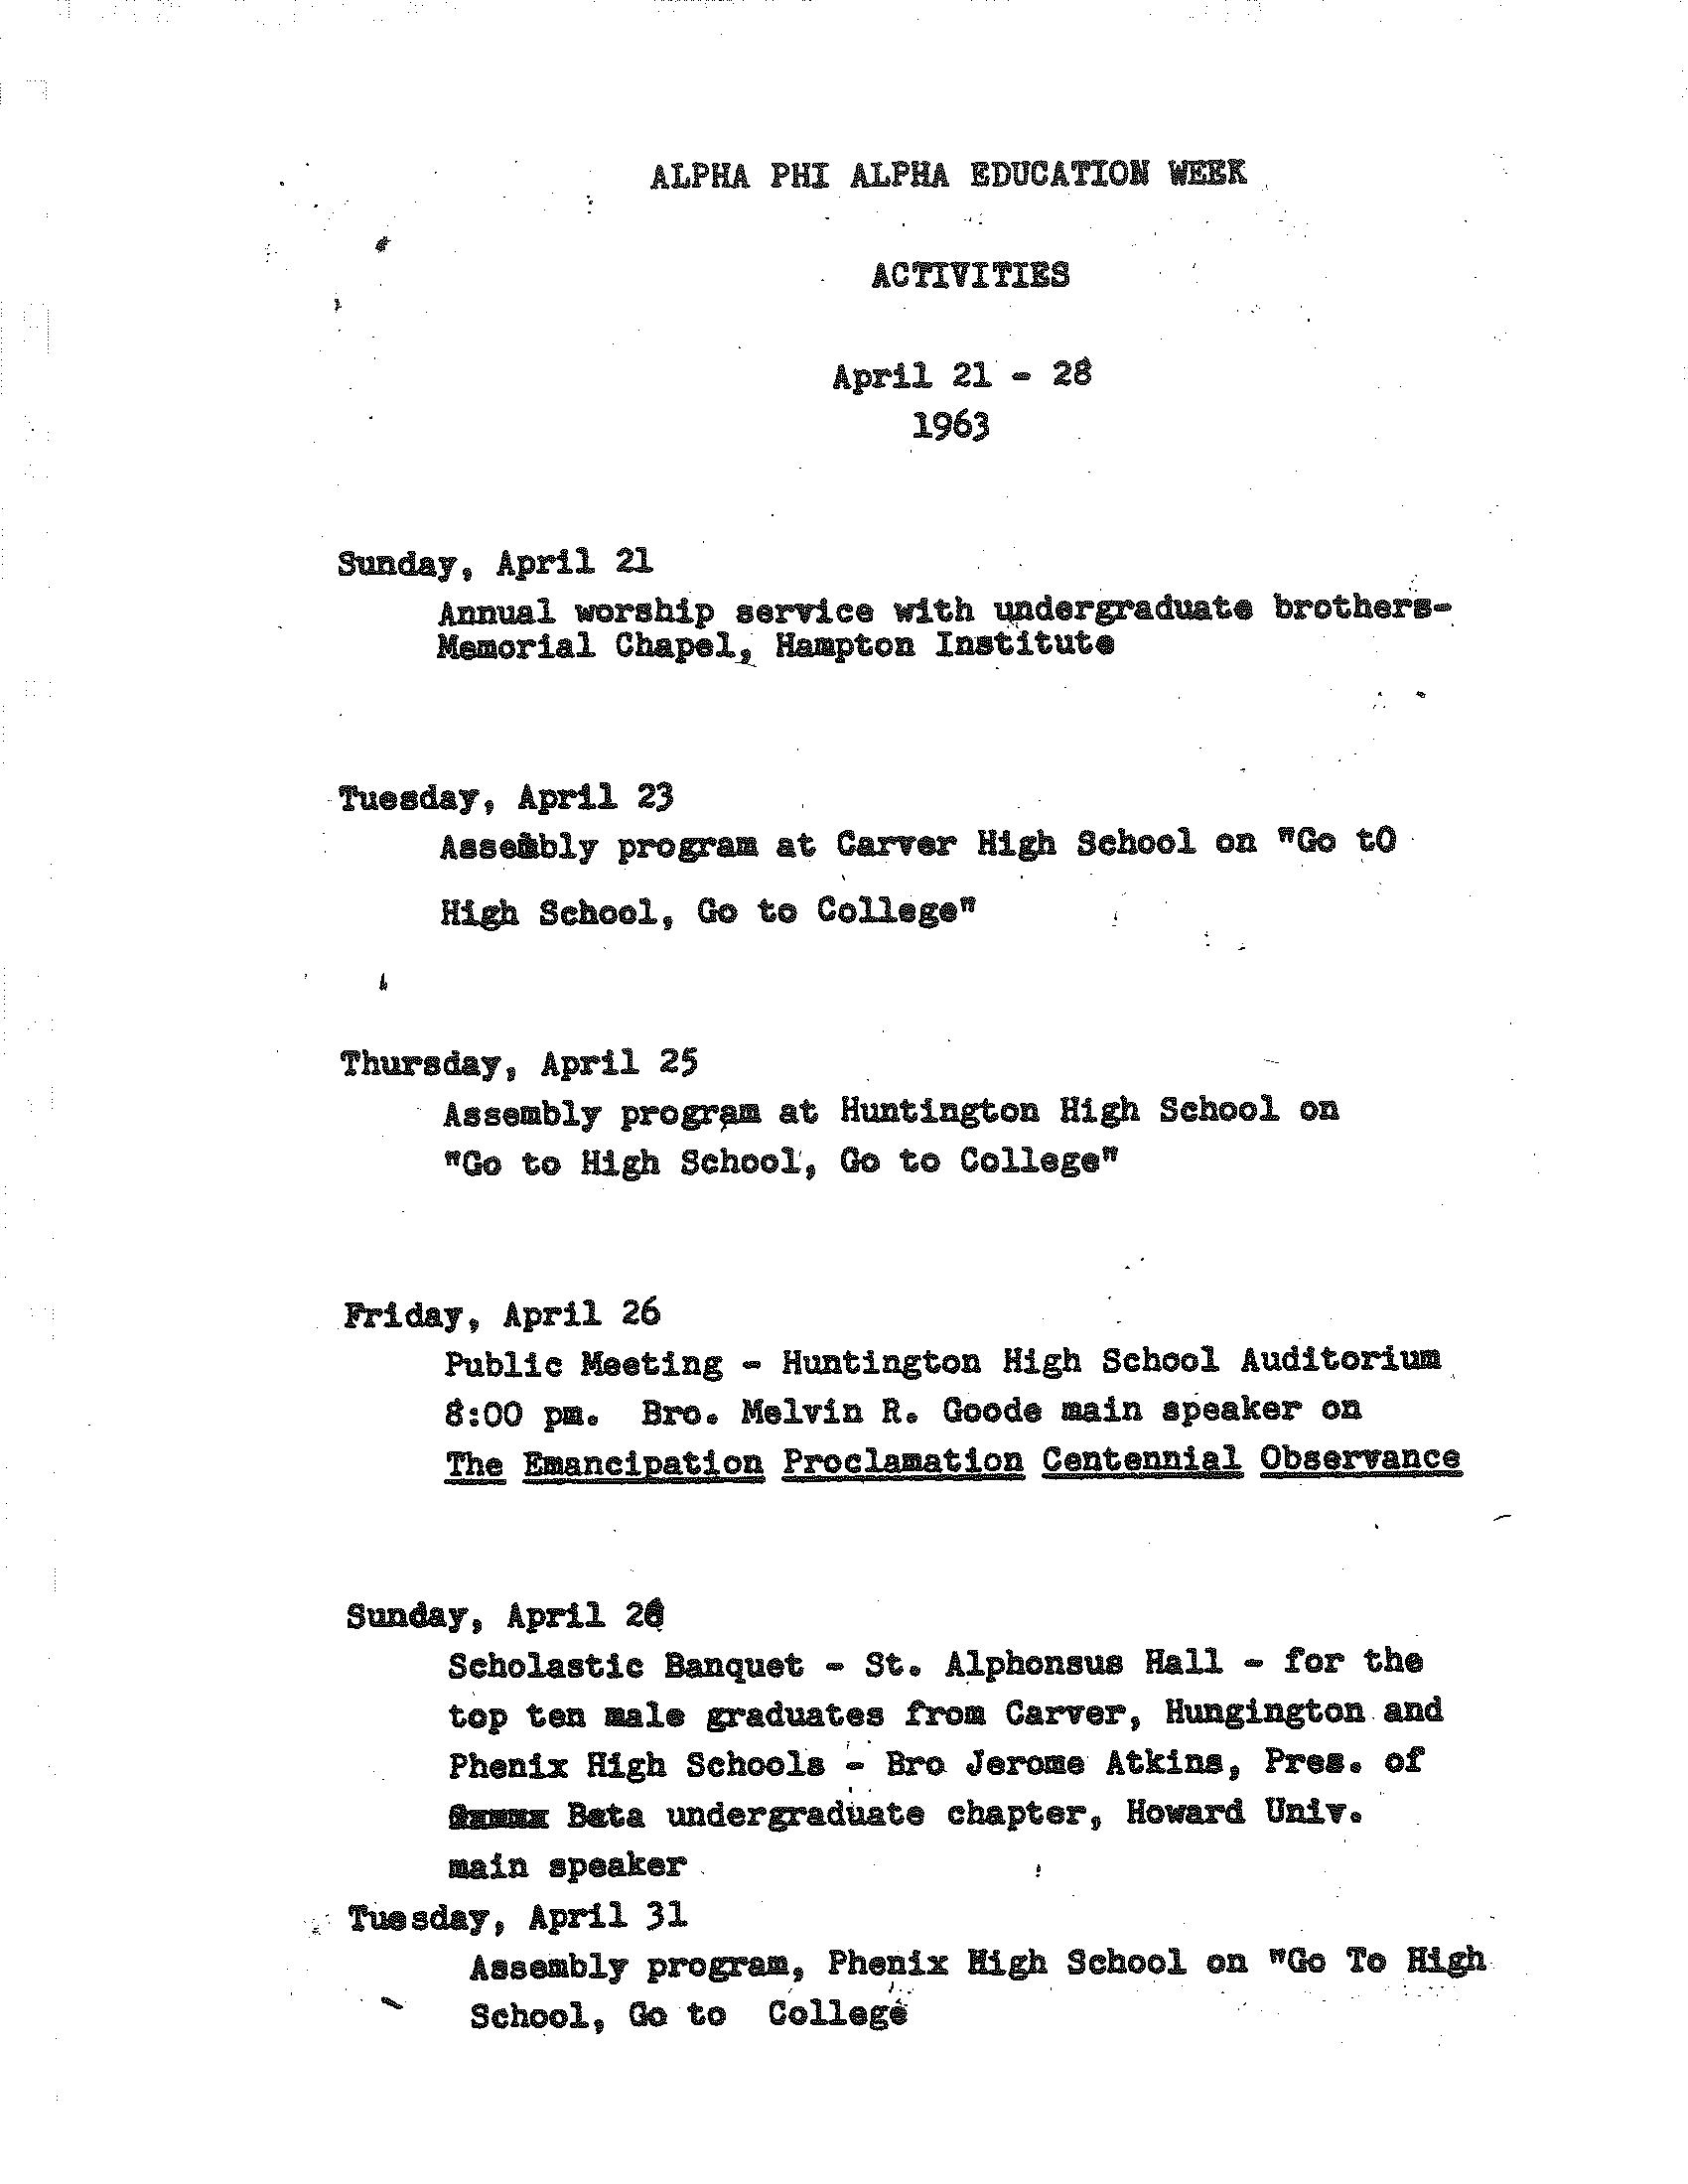 Zeta Lambda 1963 - Education Week-1.png